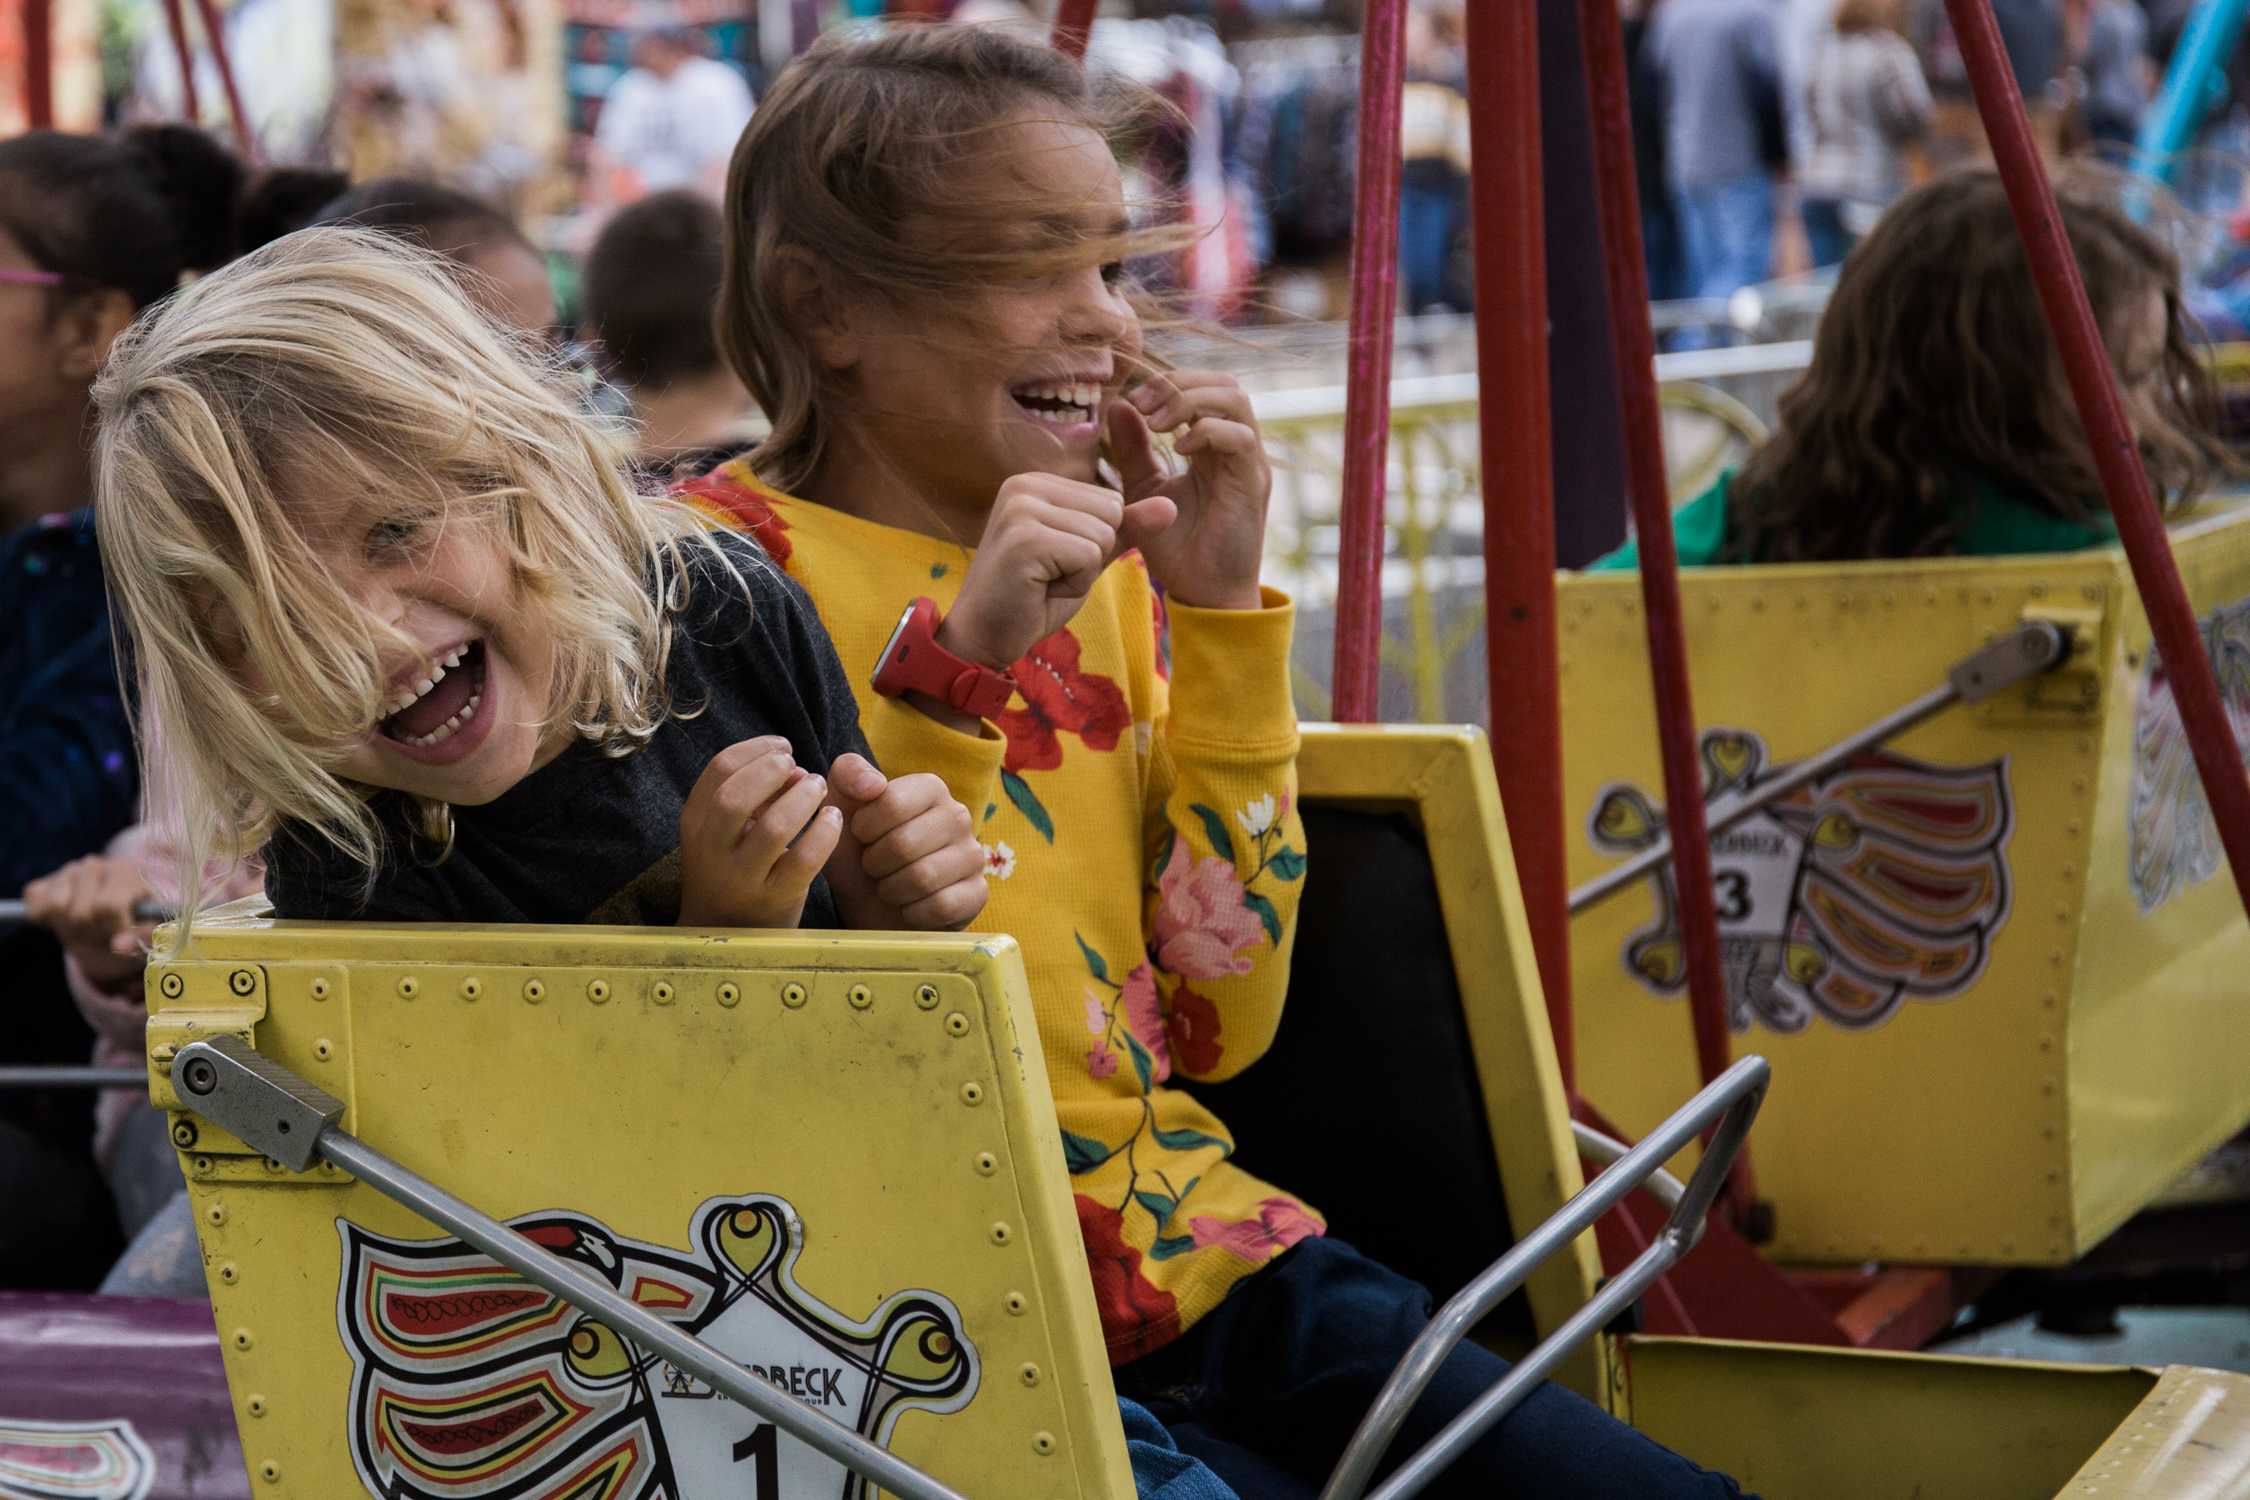 Family Fun at the allegan county faire